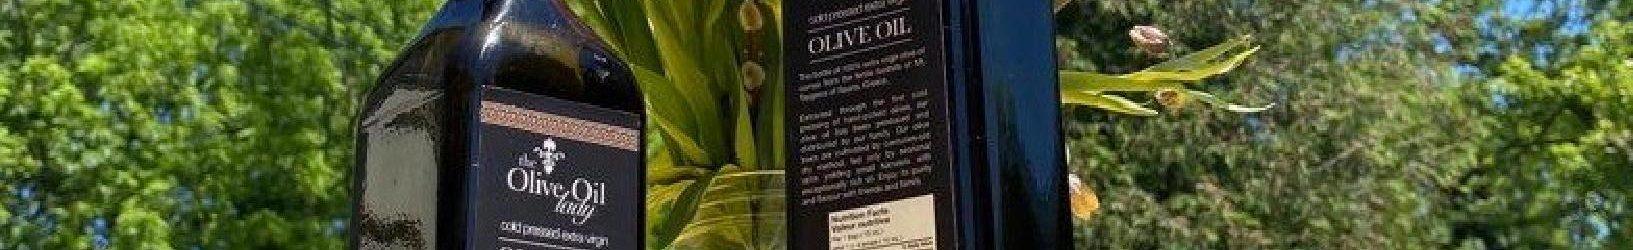 The Olive Oil Lady Regular Extra Virgin Olive Oil -750ml bottle